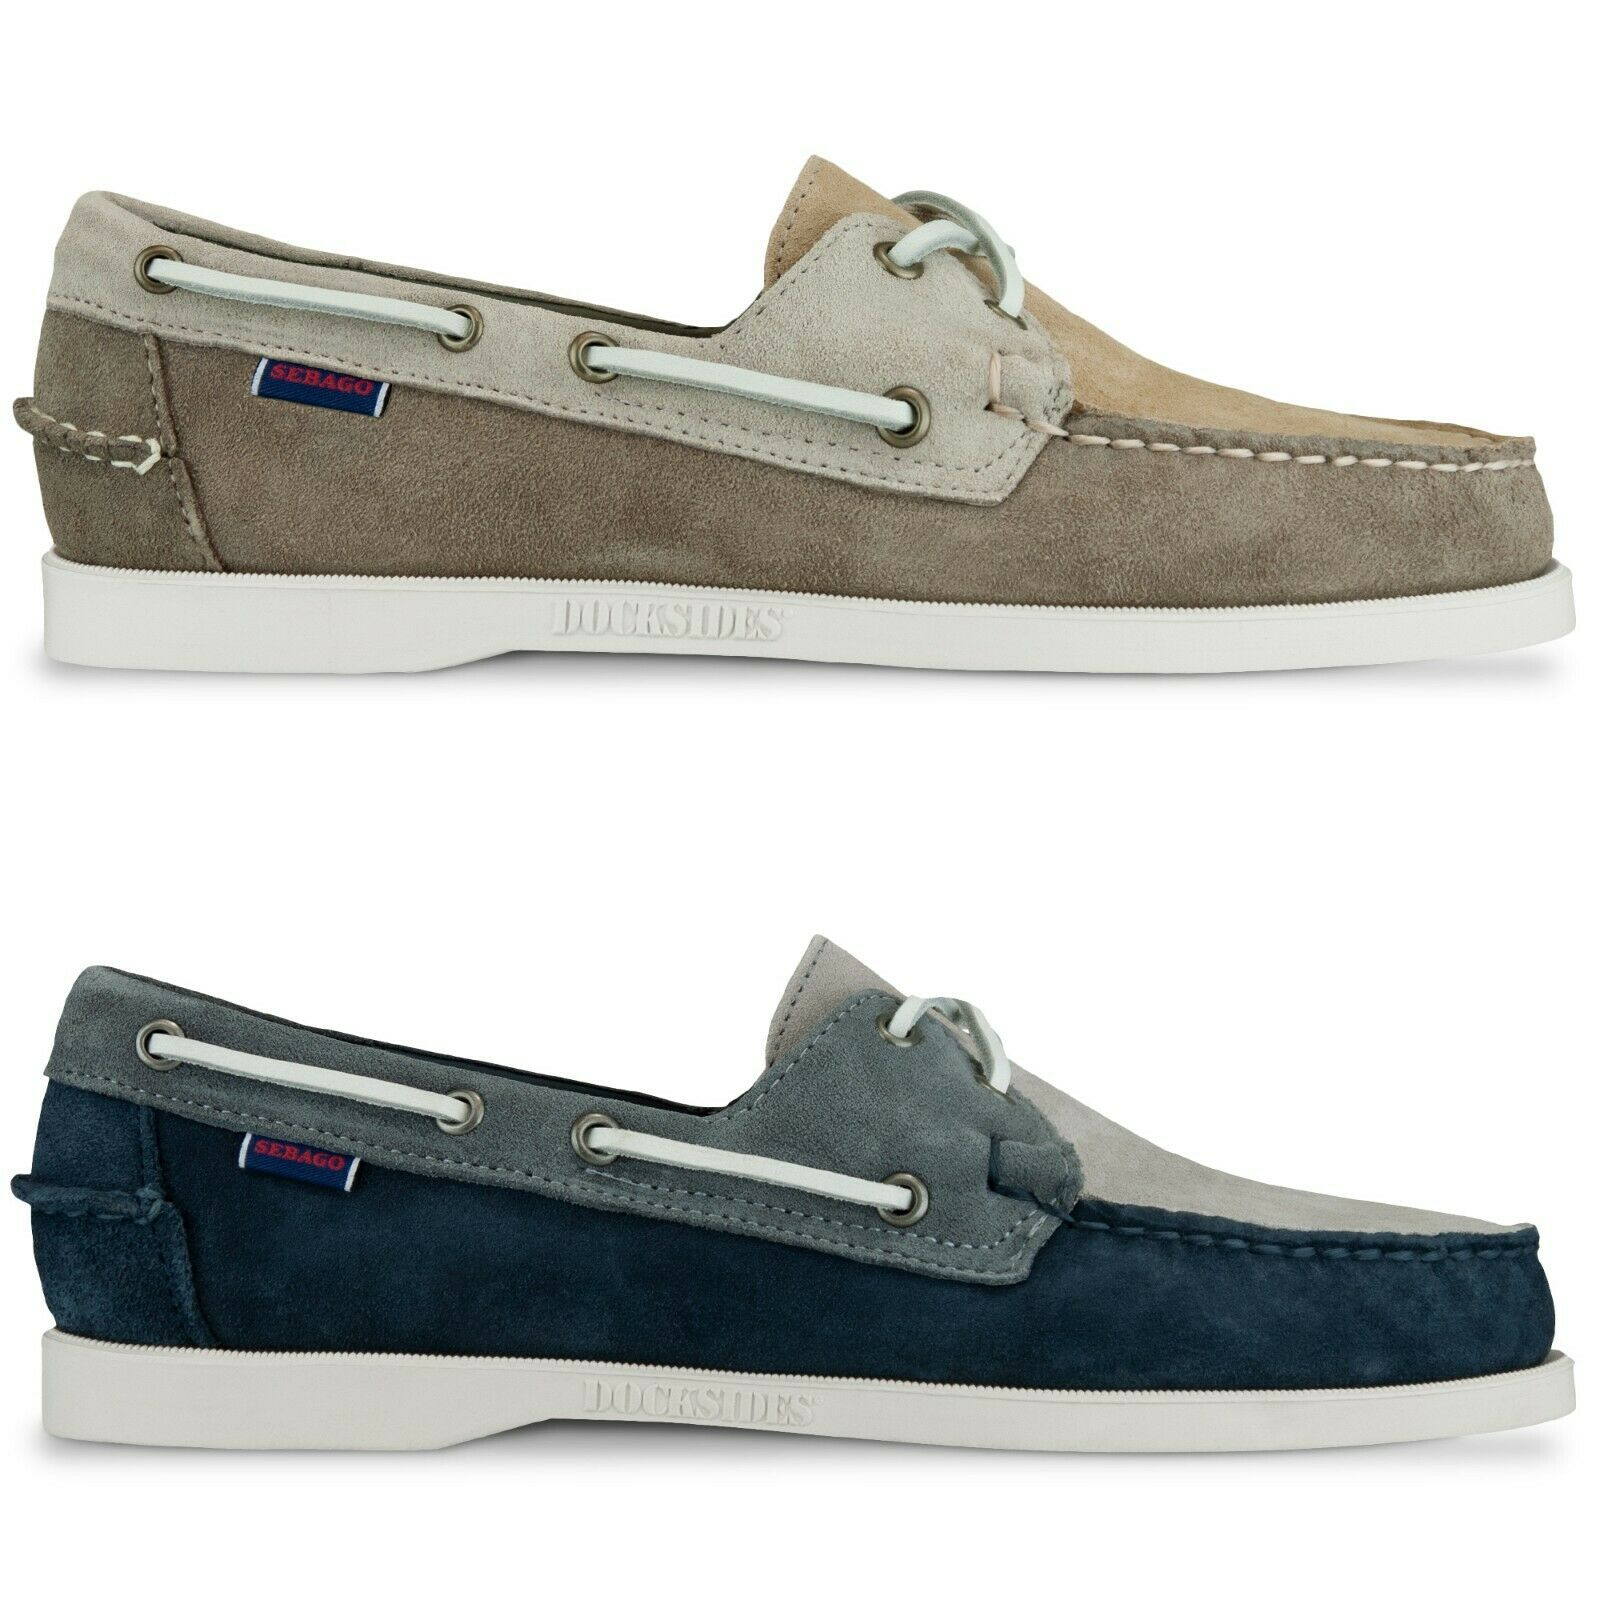 Sebago shoes - Sebago Docksides Portland Jib Boat shoes  - Taupe, Navy Suede